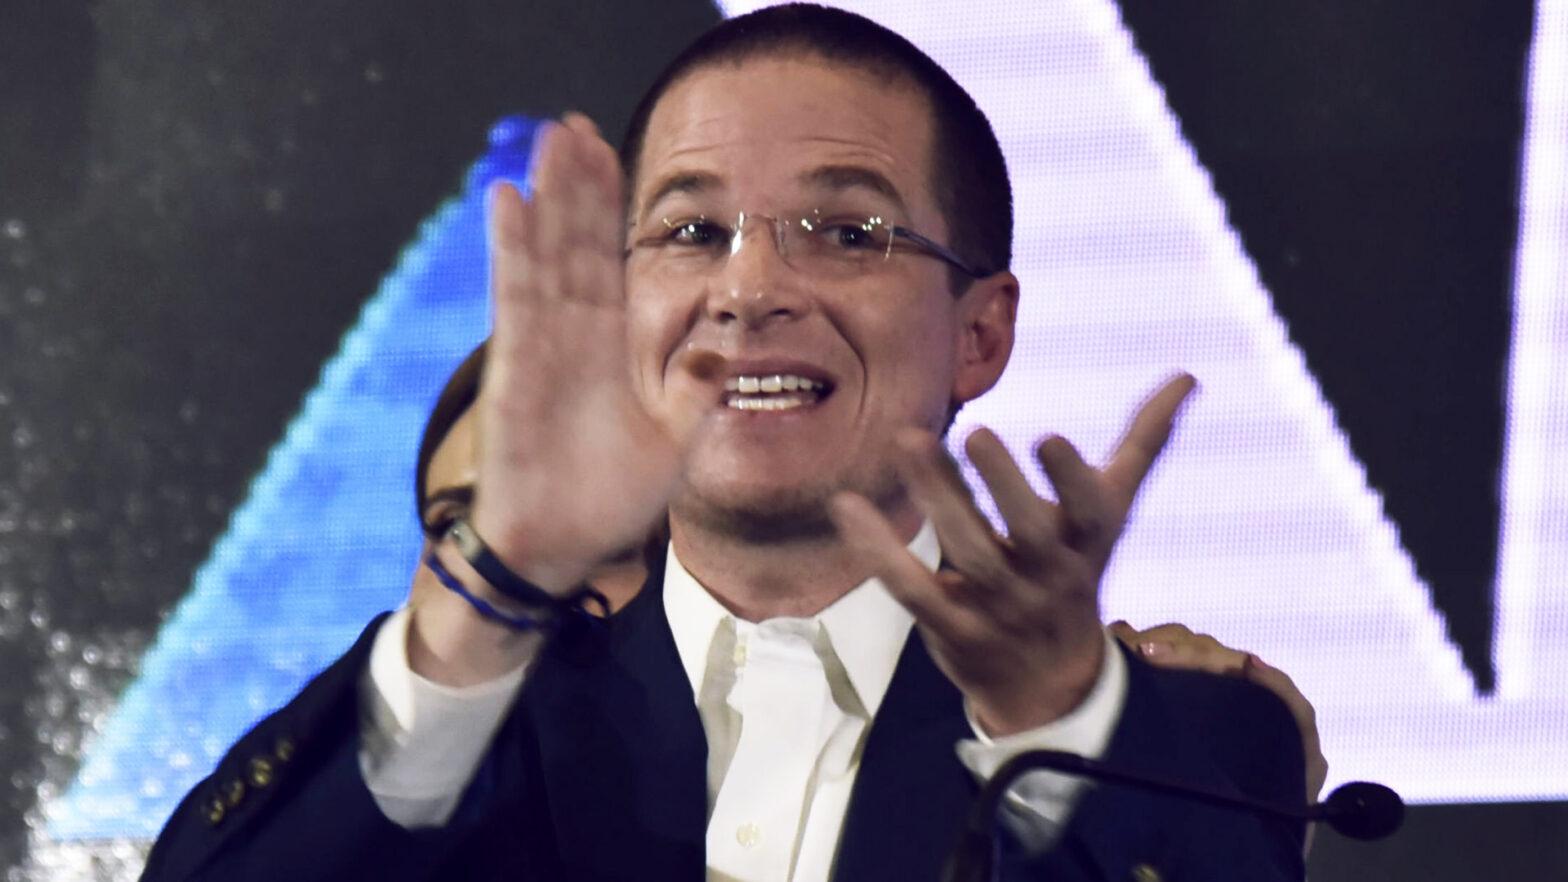 el panista Ricardo Anaya